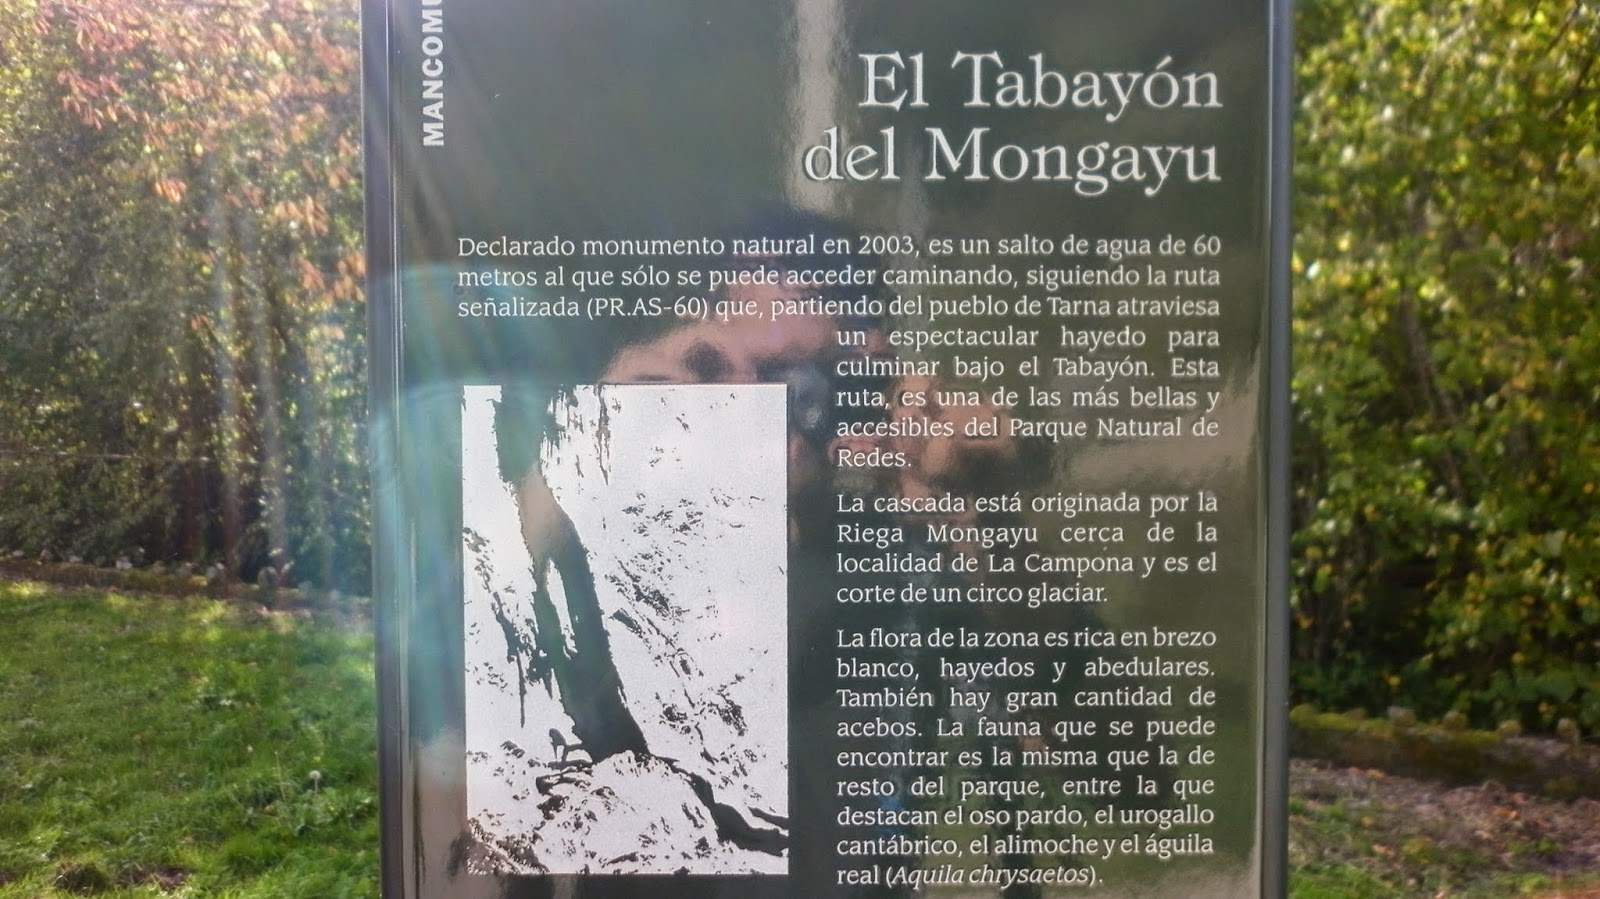 Tabayón del Mongayo, monumento natural.